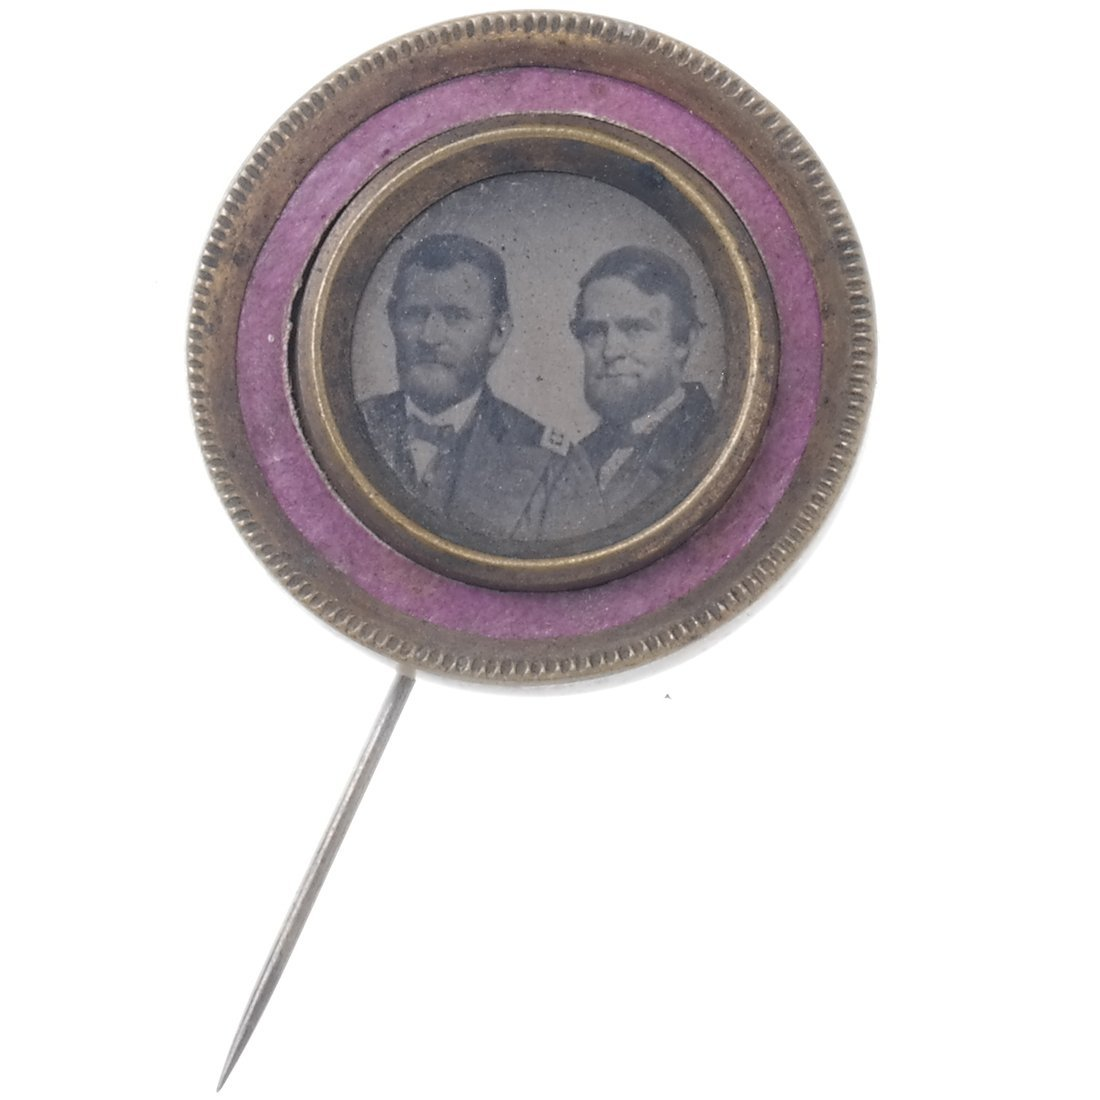 Grant & Colfax 1868 Ferrotype Pinback